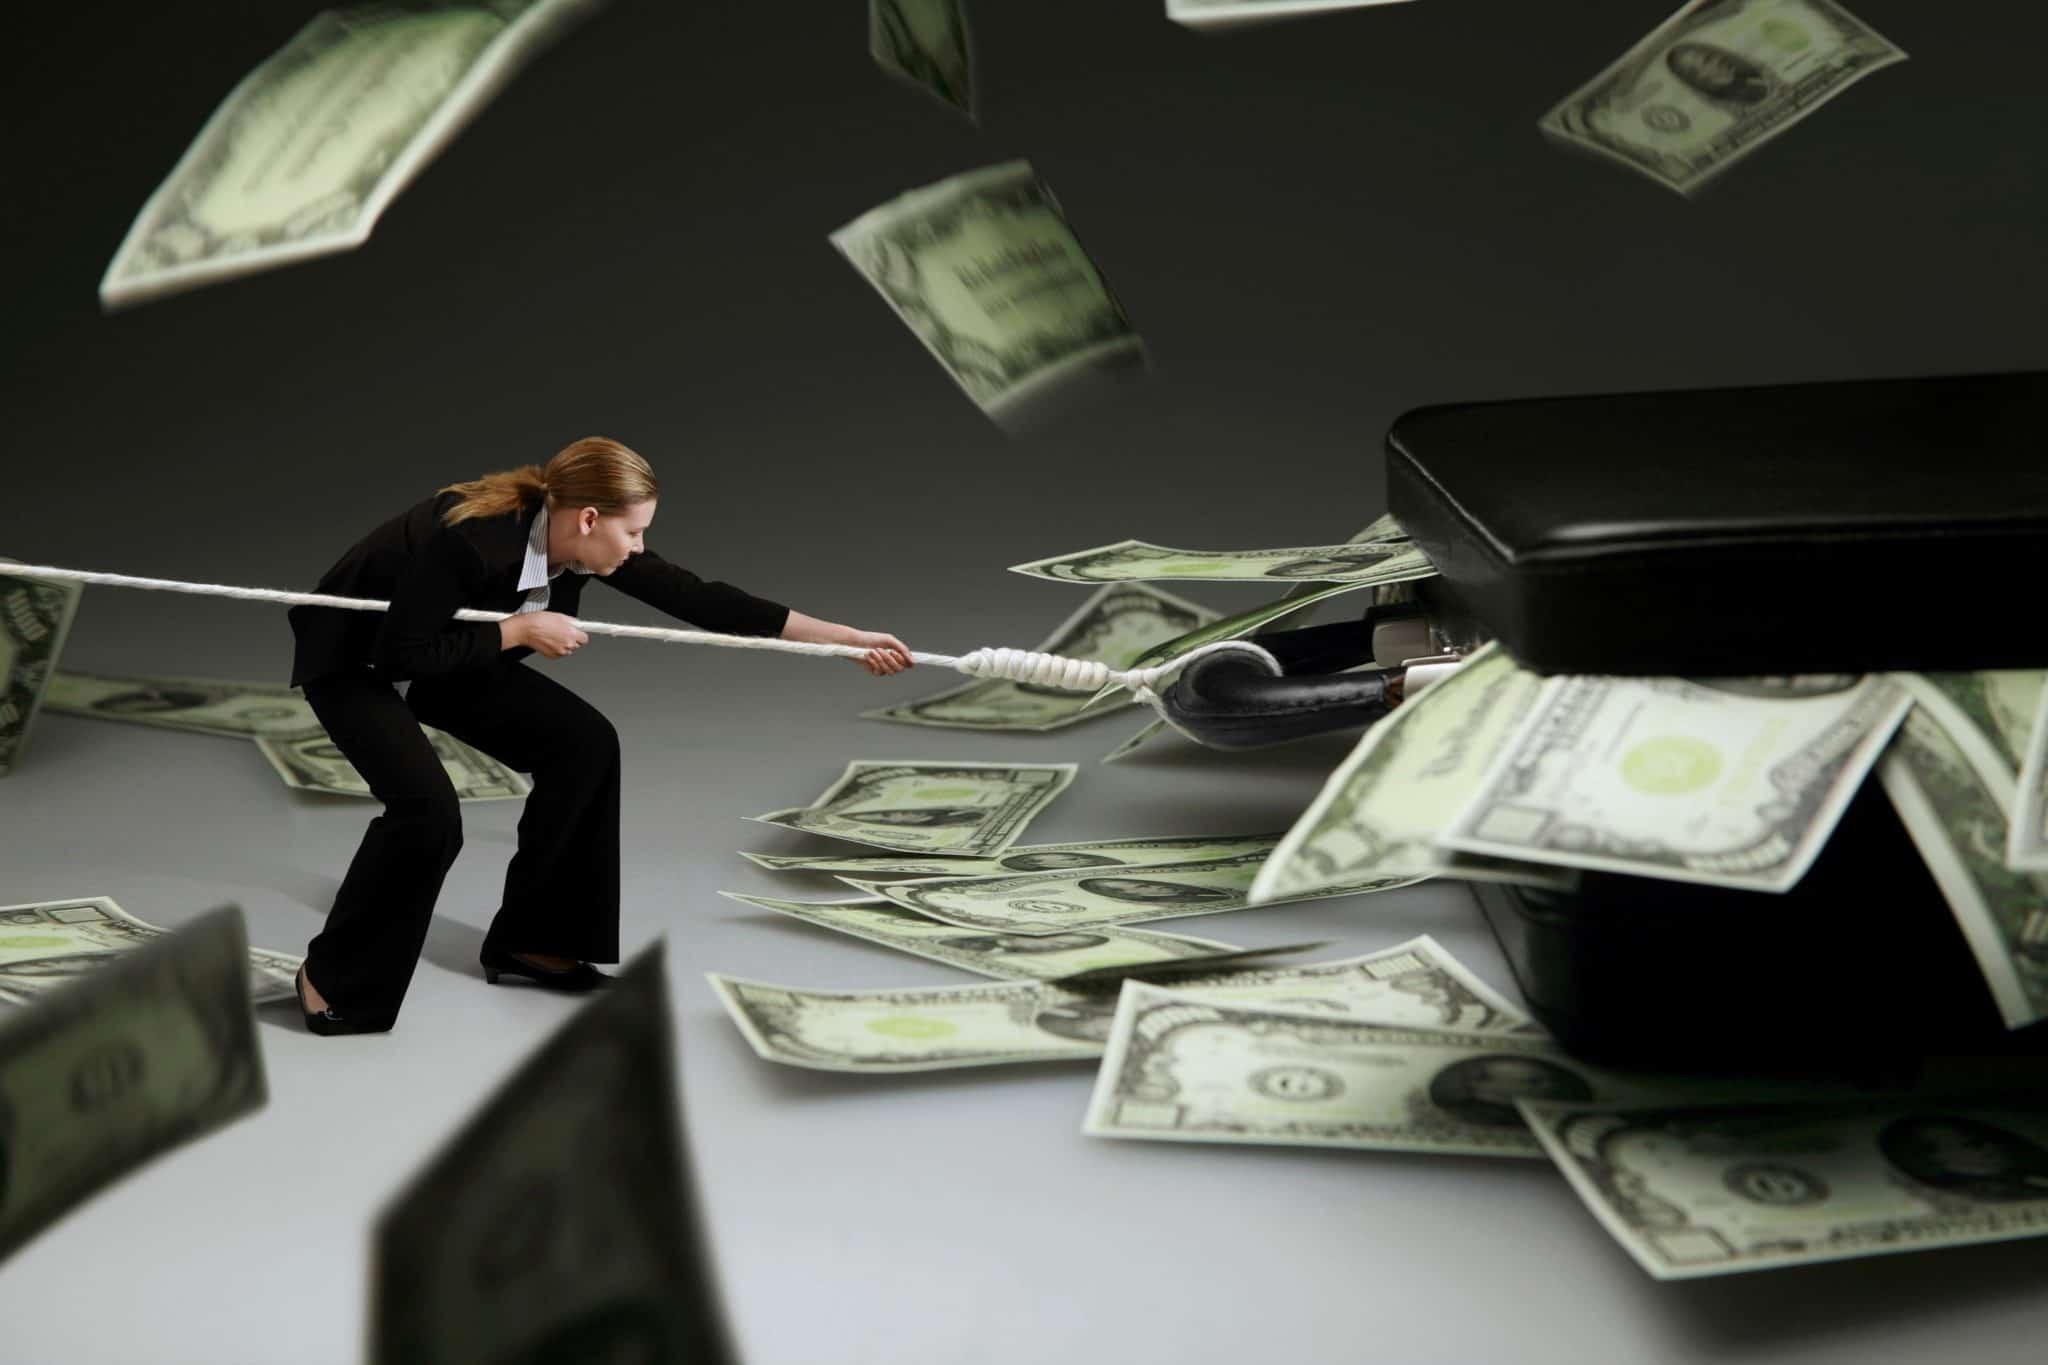 Hawaii Monopolistic State Fund - A Shocking Possibility